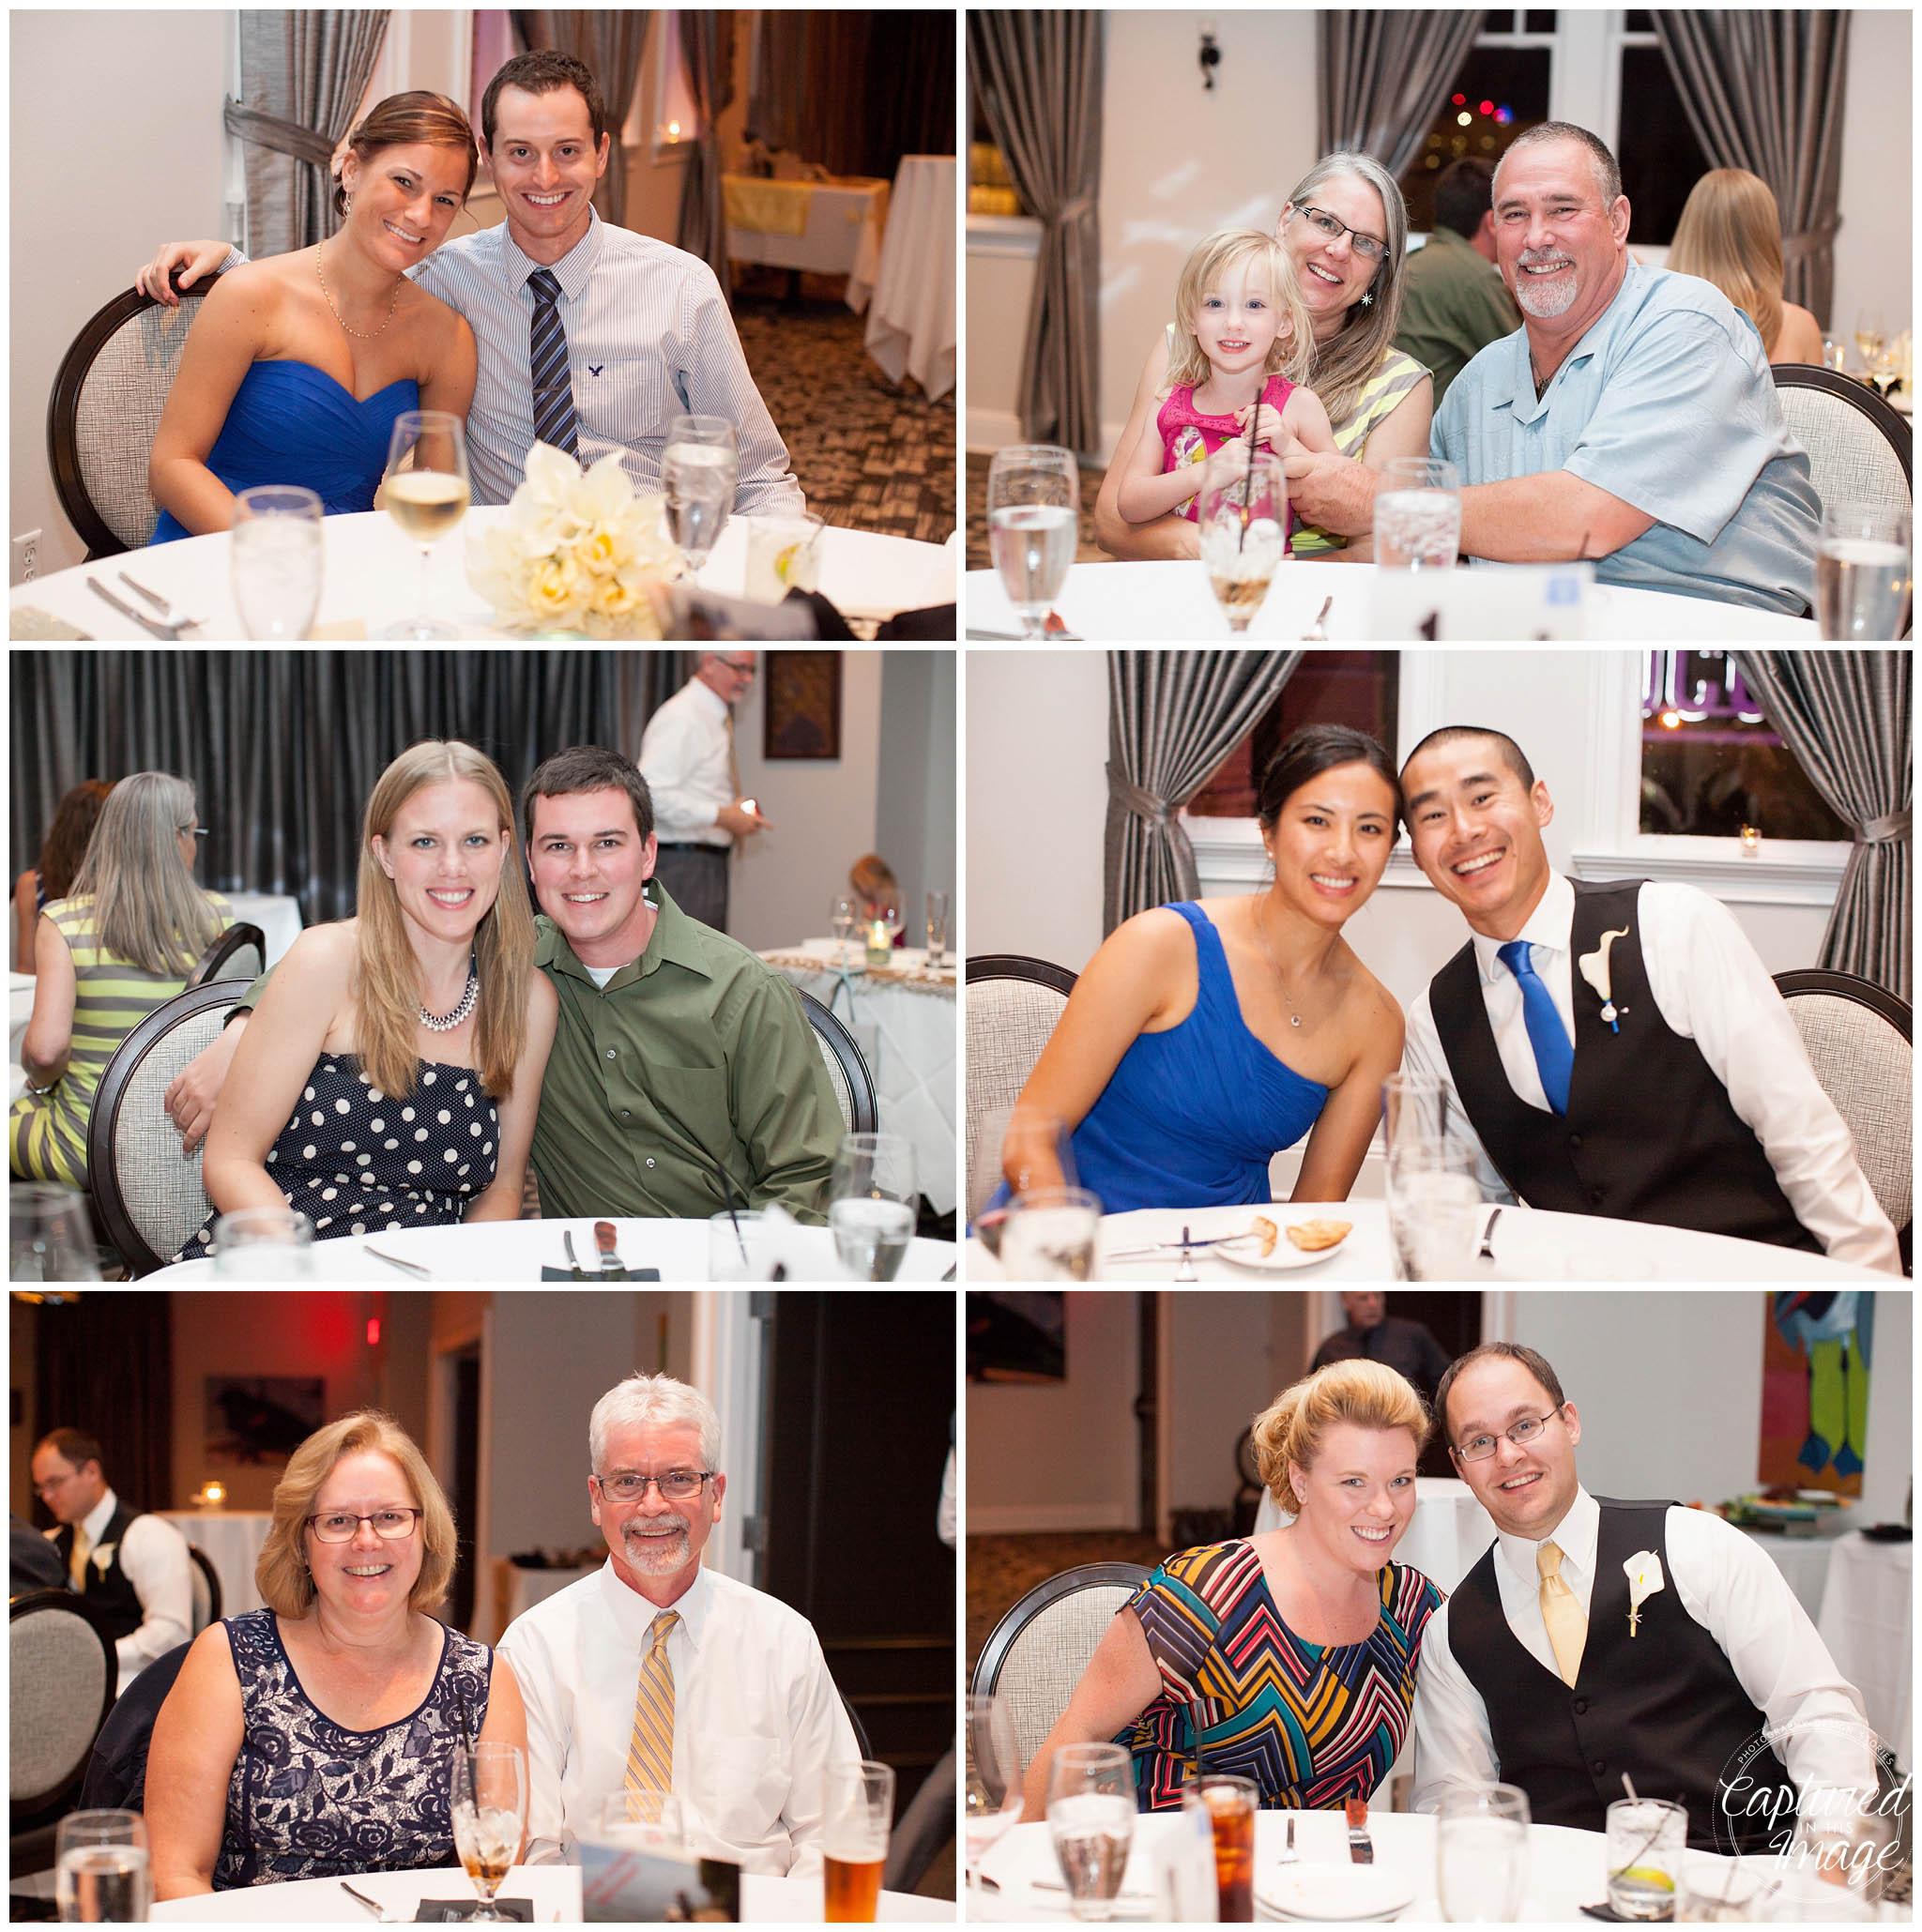 St. Pete Beach Destination Wedding (58 of 81)